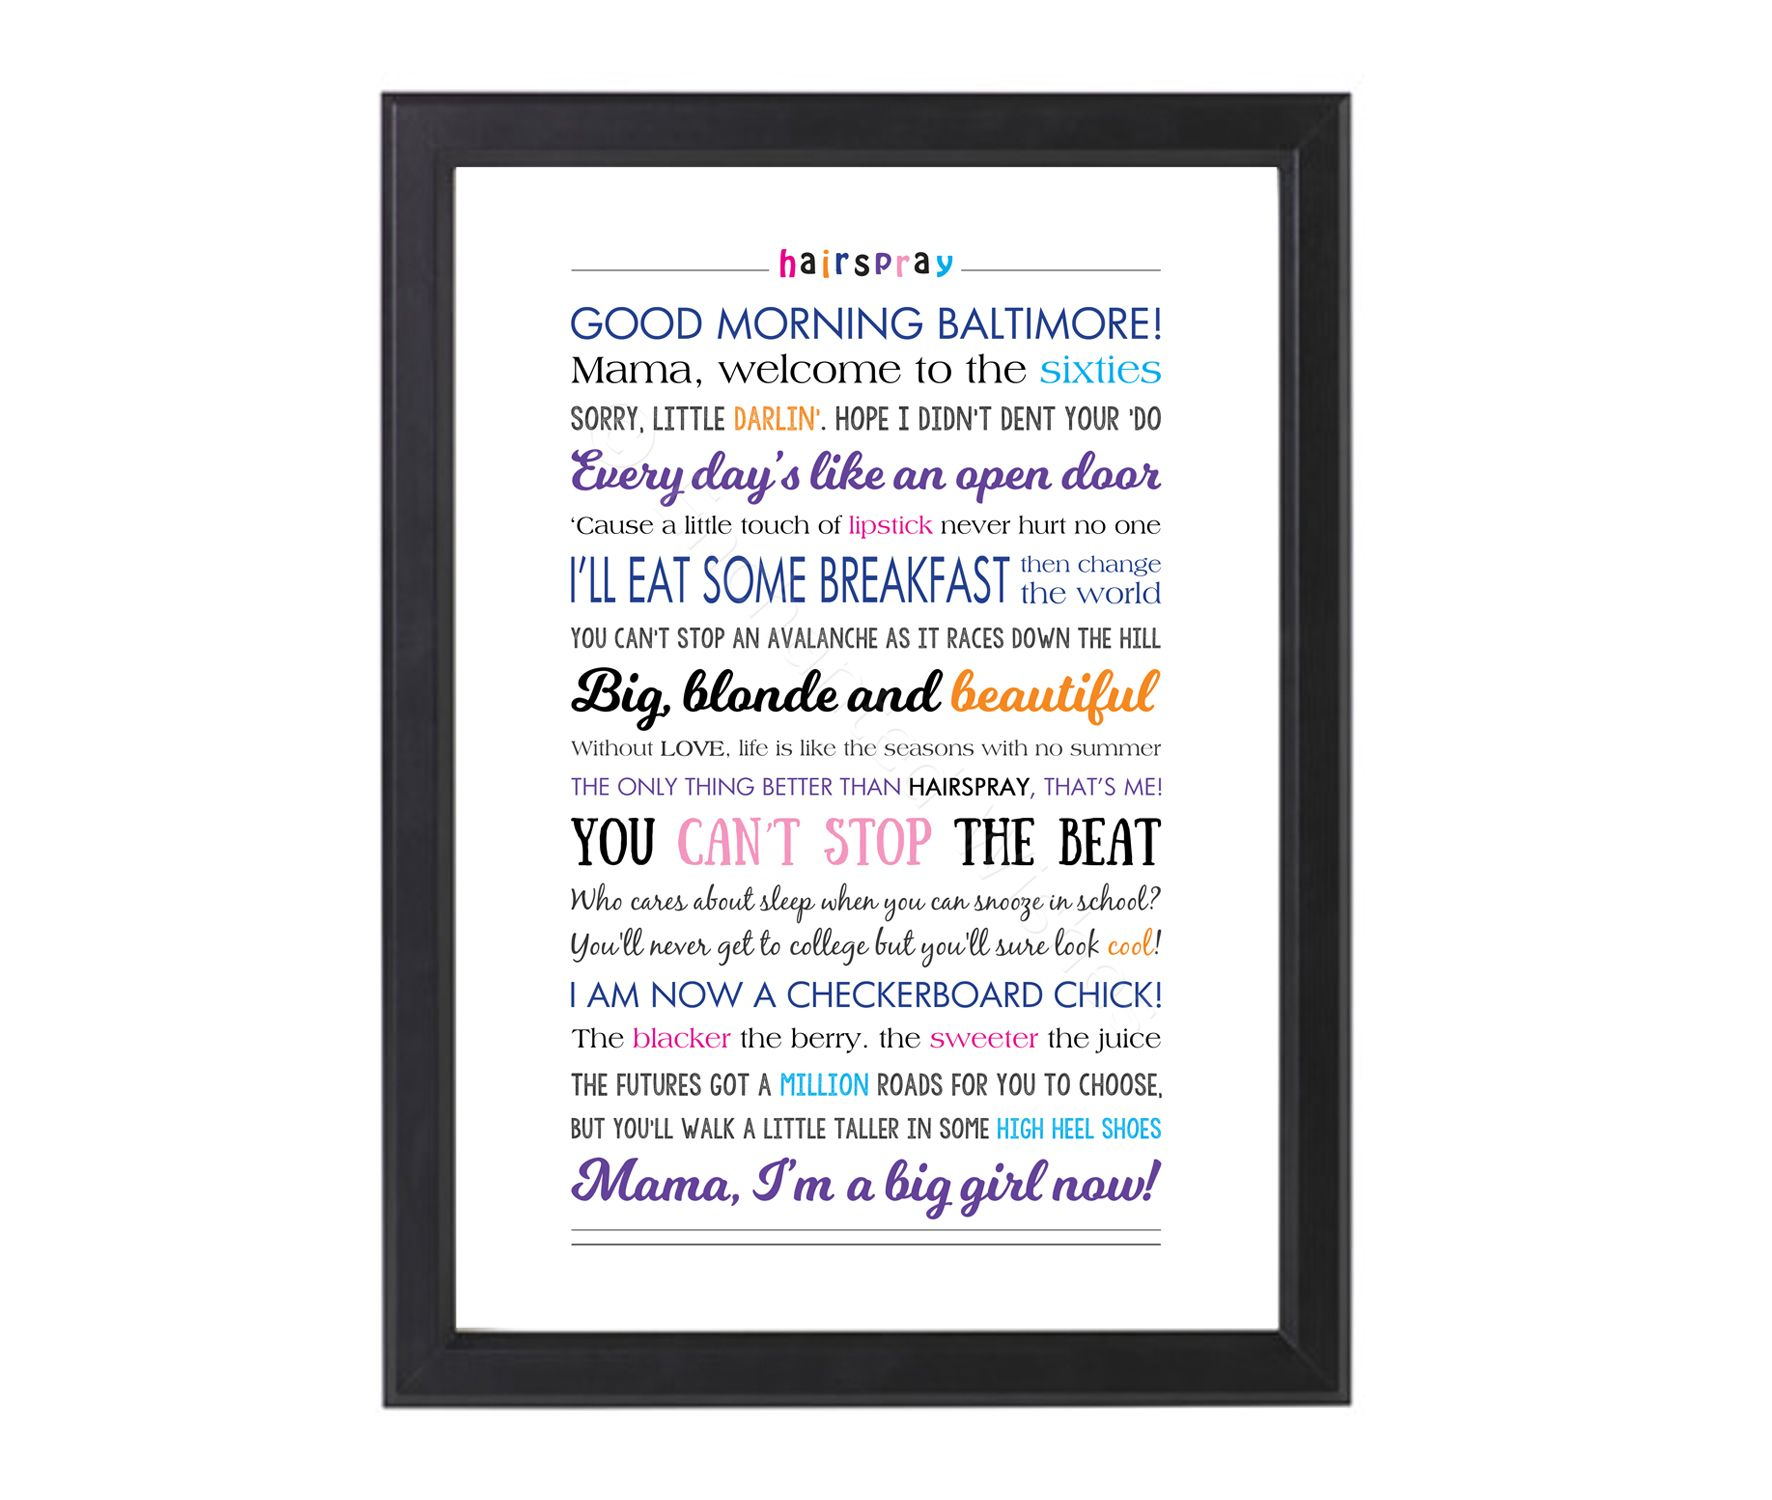 Hairspray Musical Quotes Lyrics Print Prints Wall Art Quote